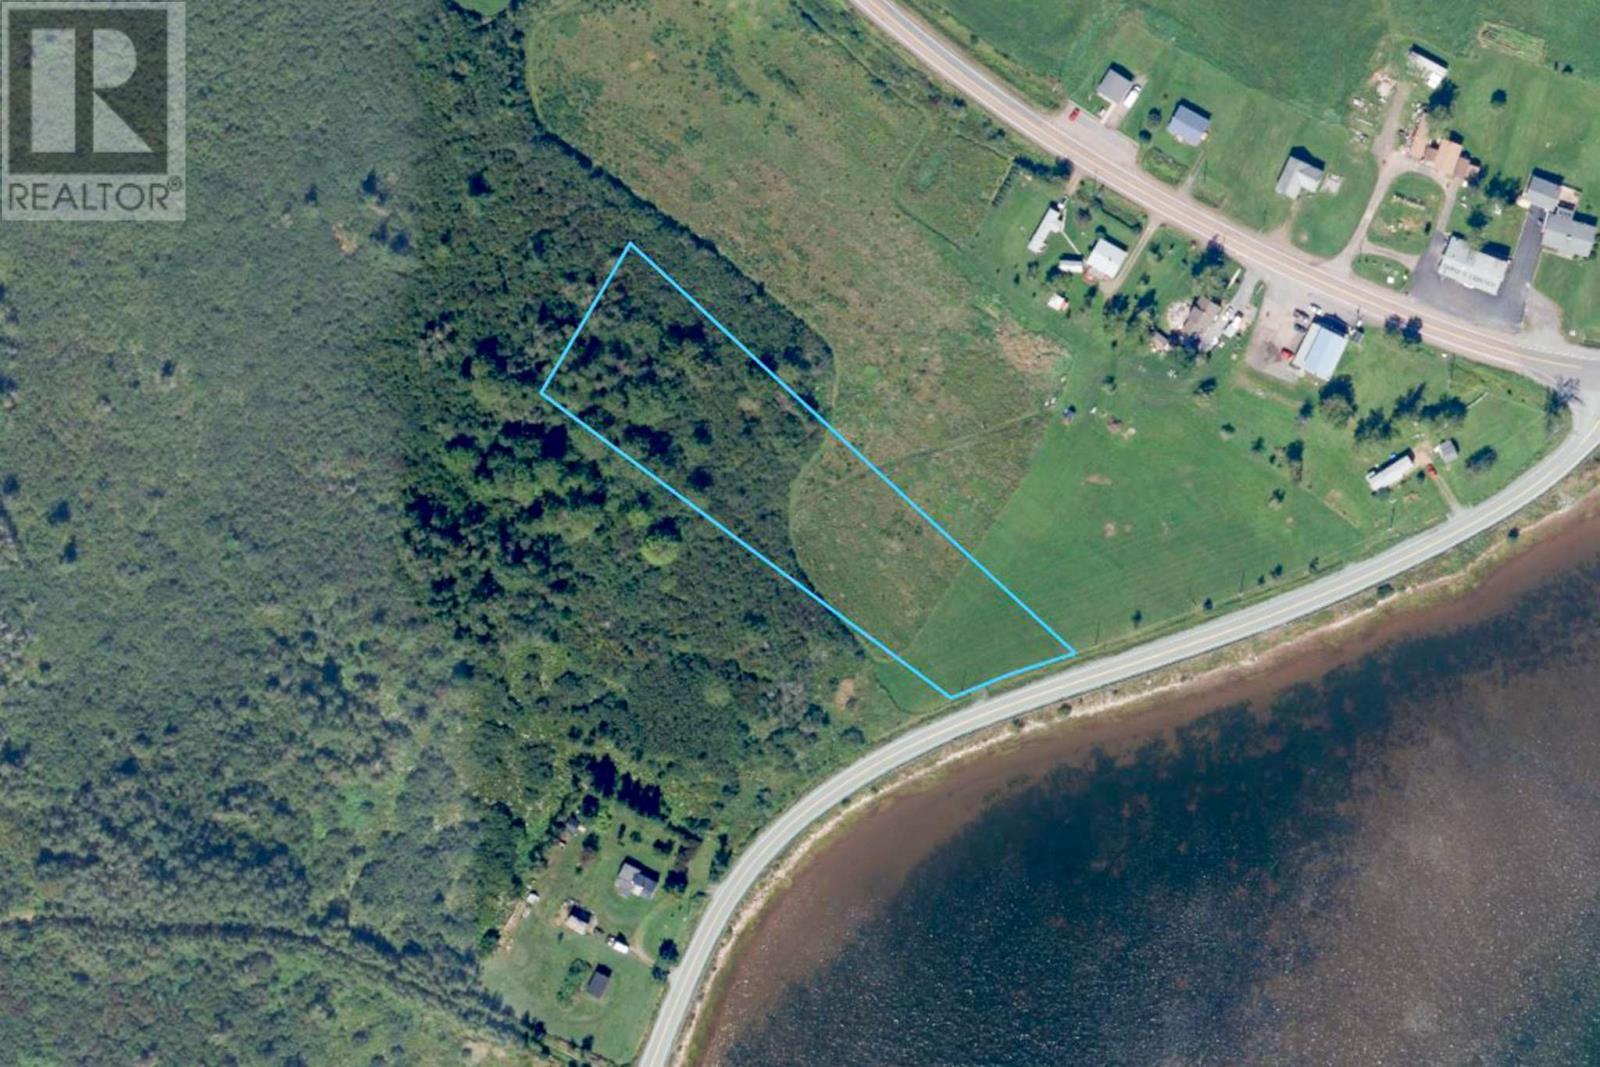 Lot 19-2 Kolbec Road, Port Howe, Nova Scotia  B0K 1K0 - Photo 1 - 202000810